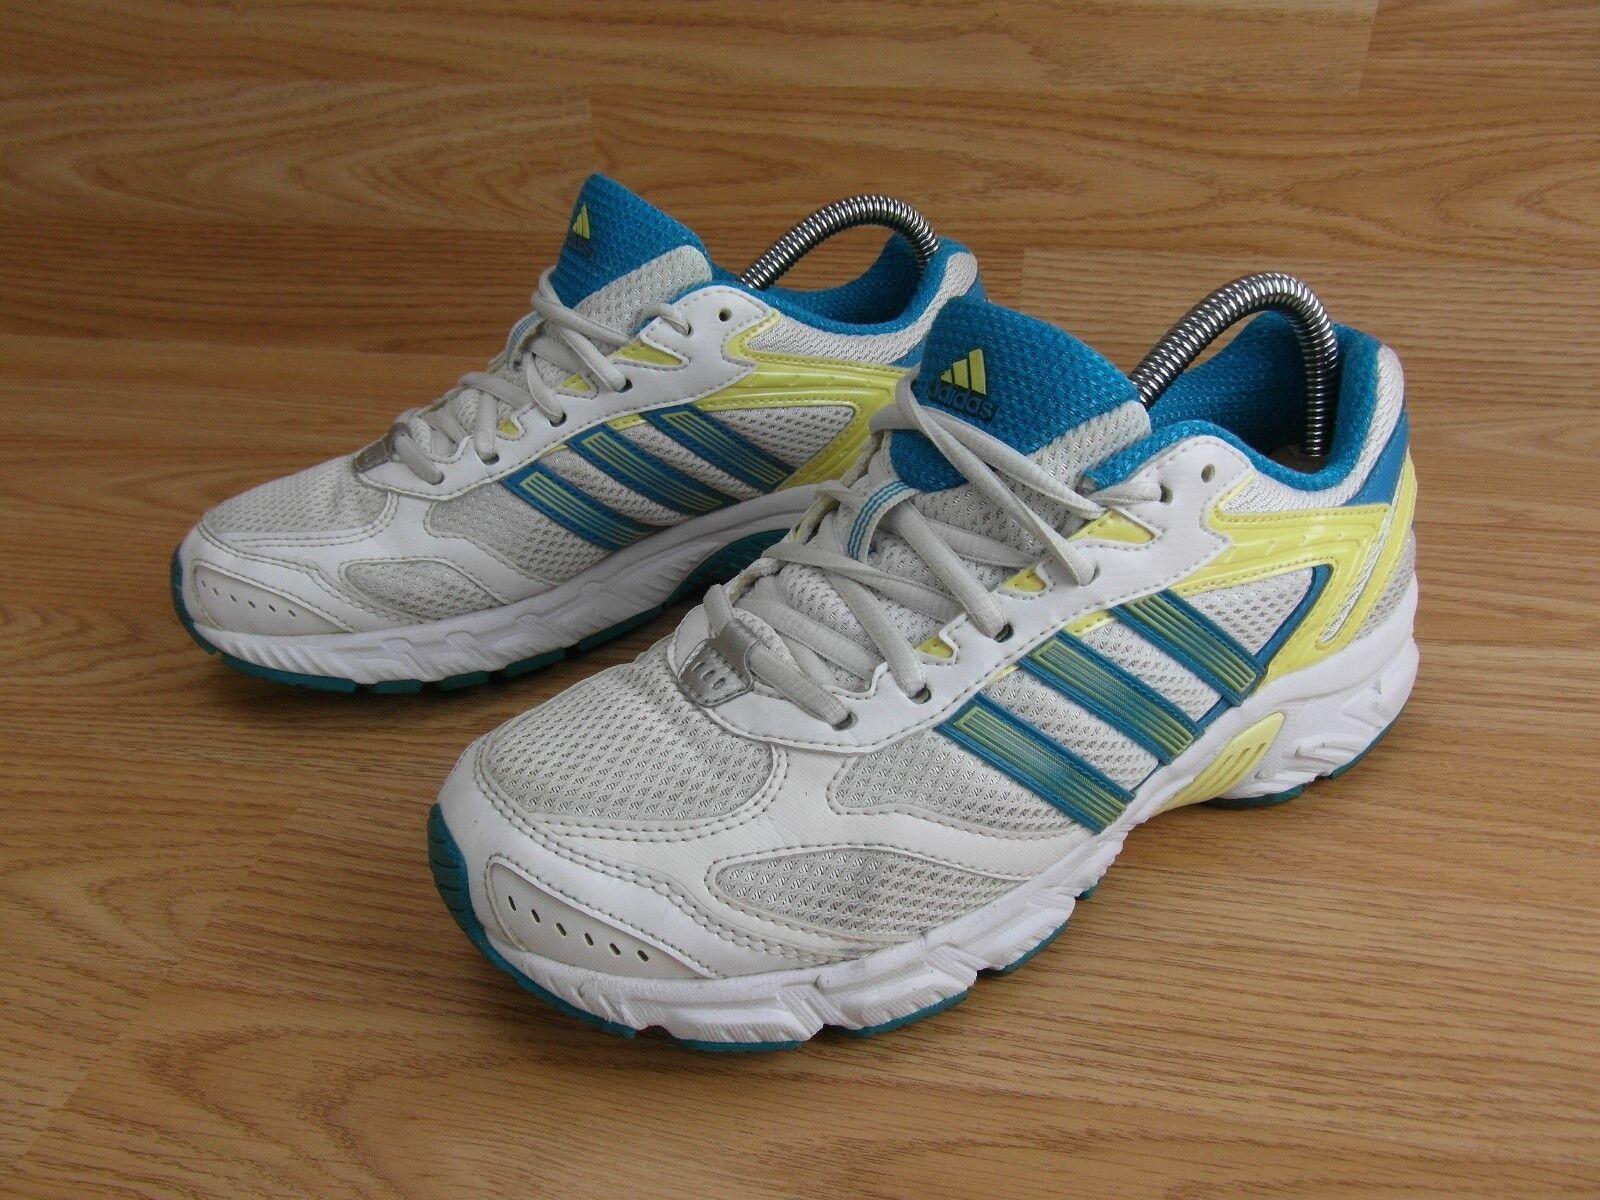 Femmes Adidas Bleu Blanc Jaune Baskets Léger Chaussures De Course 5 UK 38 eur